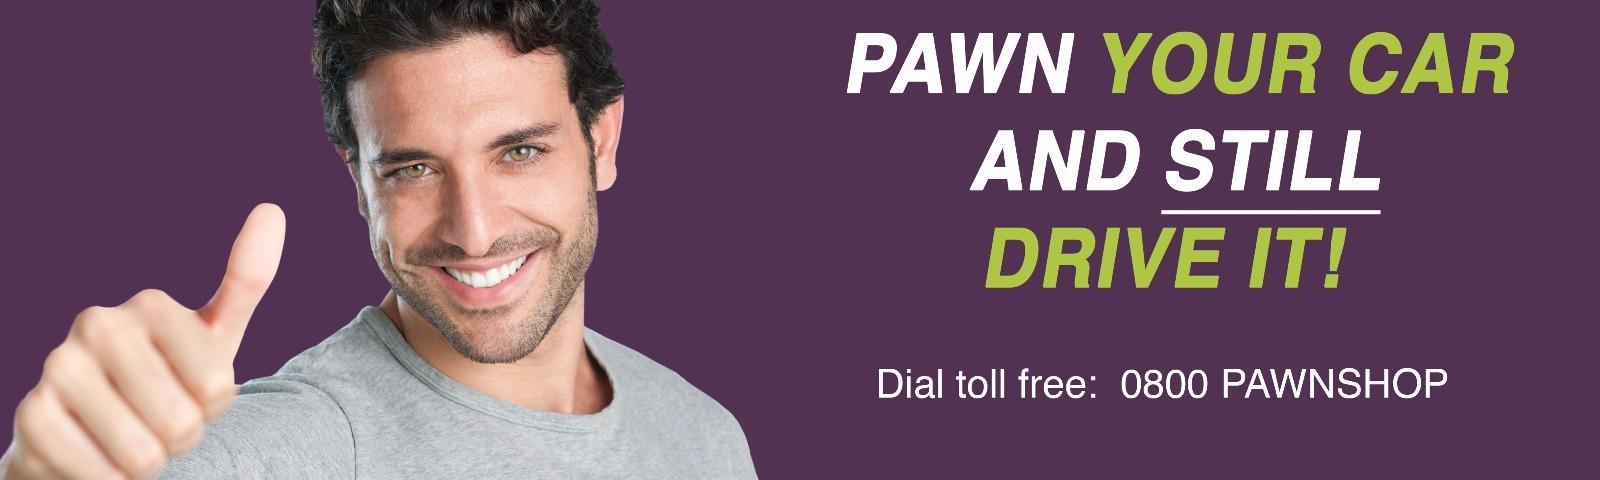 Car Pawn Options